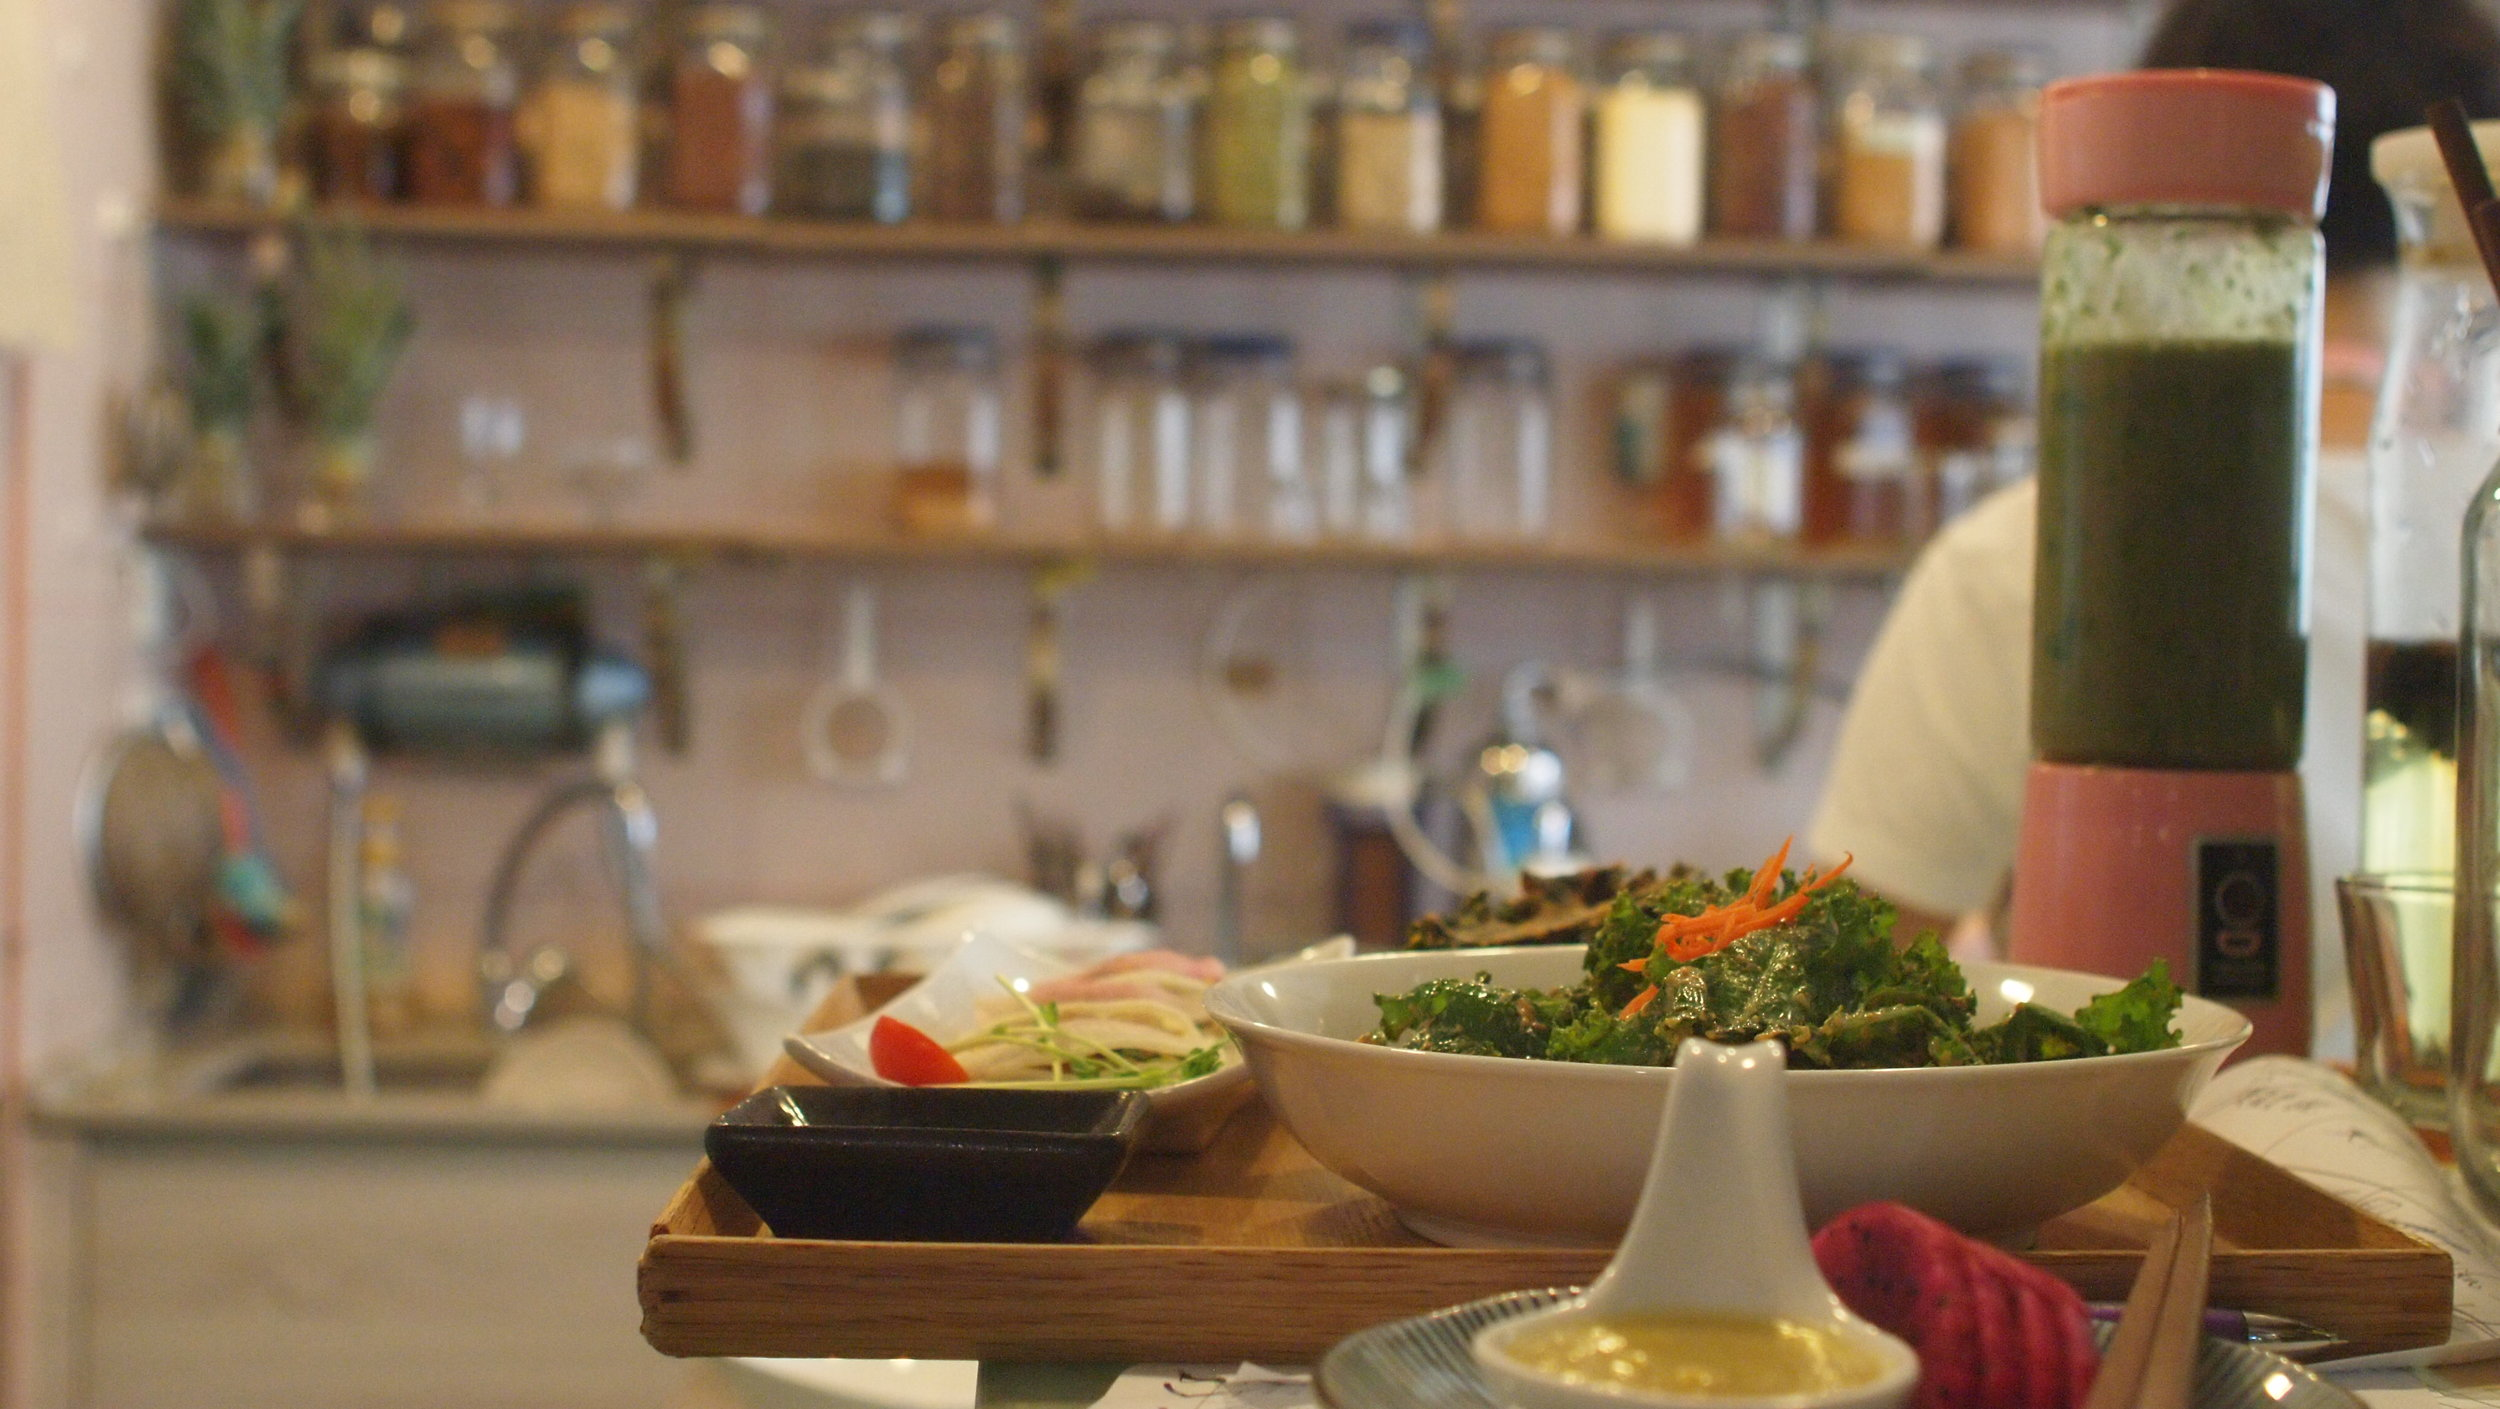 Raw-food-greenwood-cafe.JPG